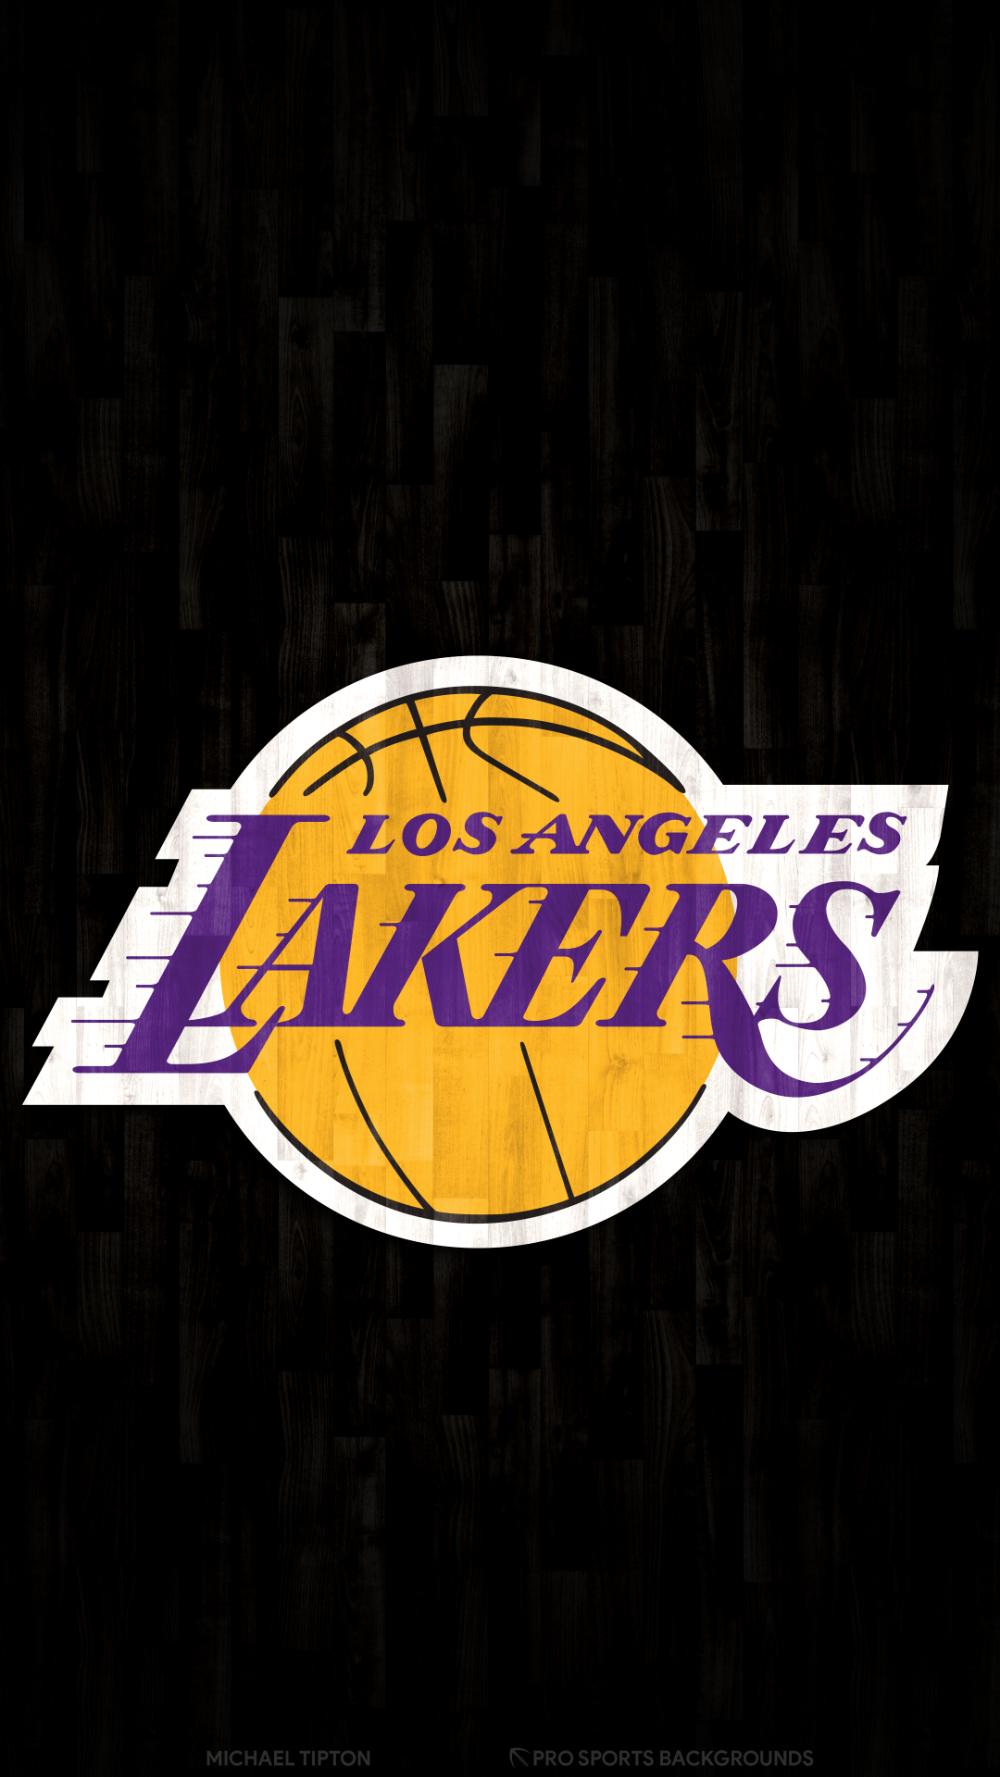 Los Angeles Lakers 4 In 2020 Lakers Wallpaper Los Angeles Lakers Logo Los Angeles Lakers